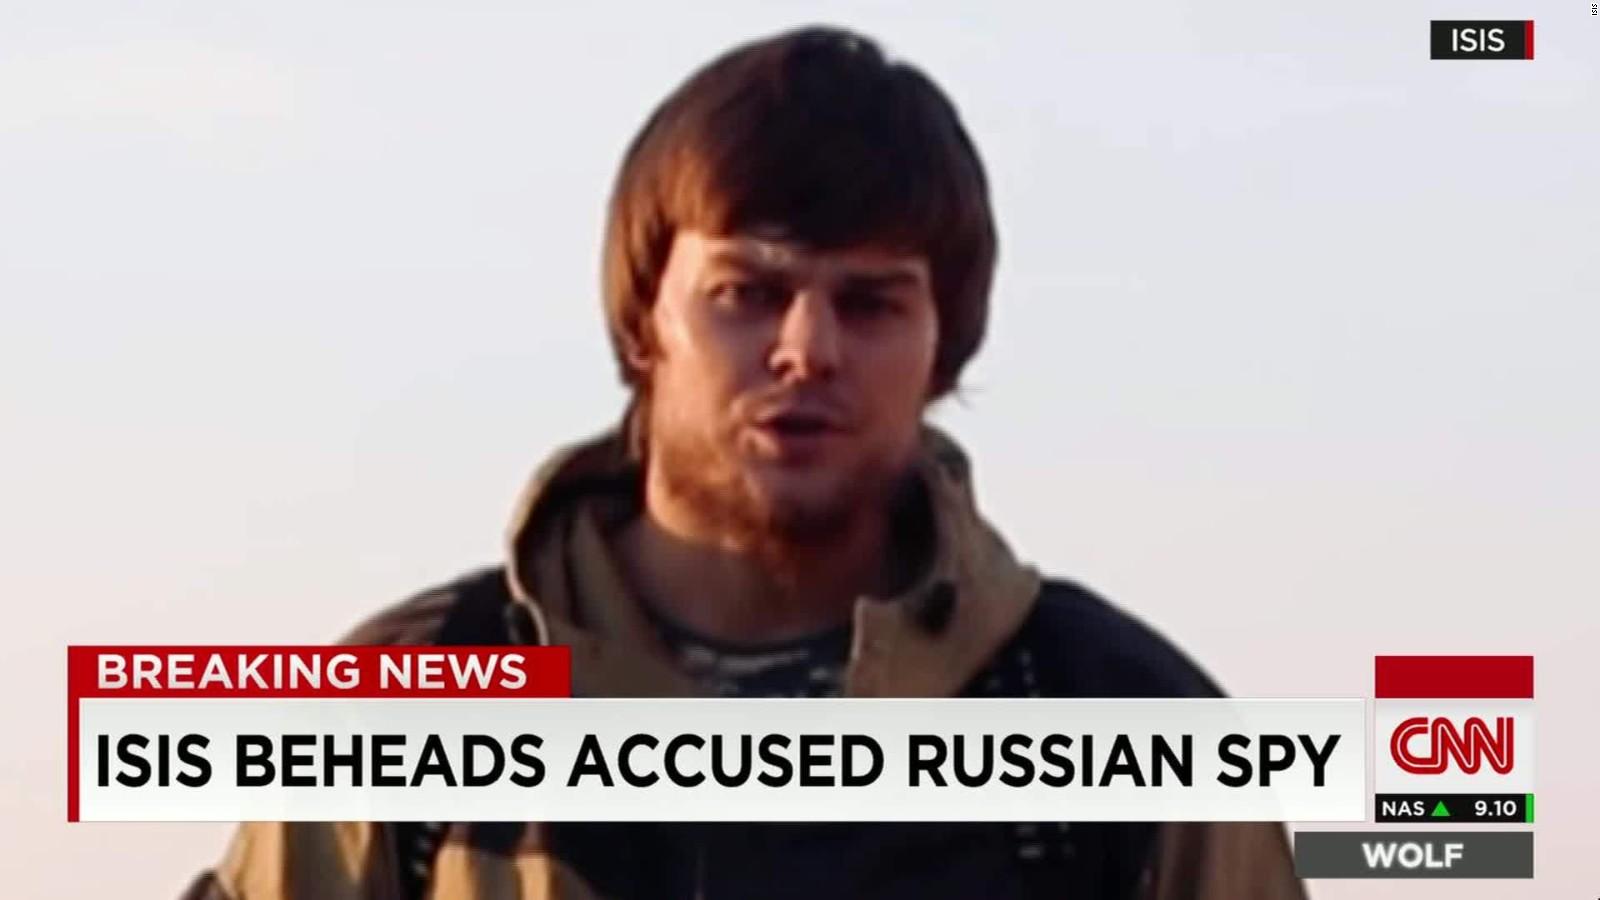 ISISBeheadsRussianSpy.jpg